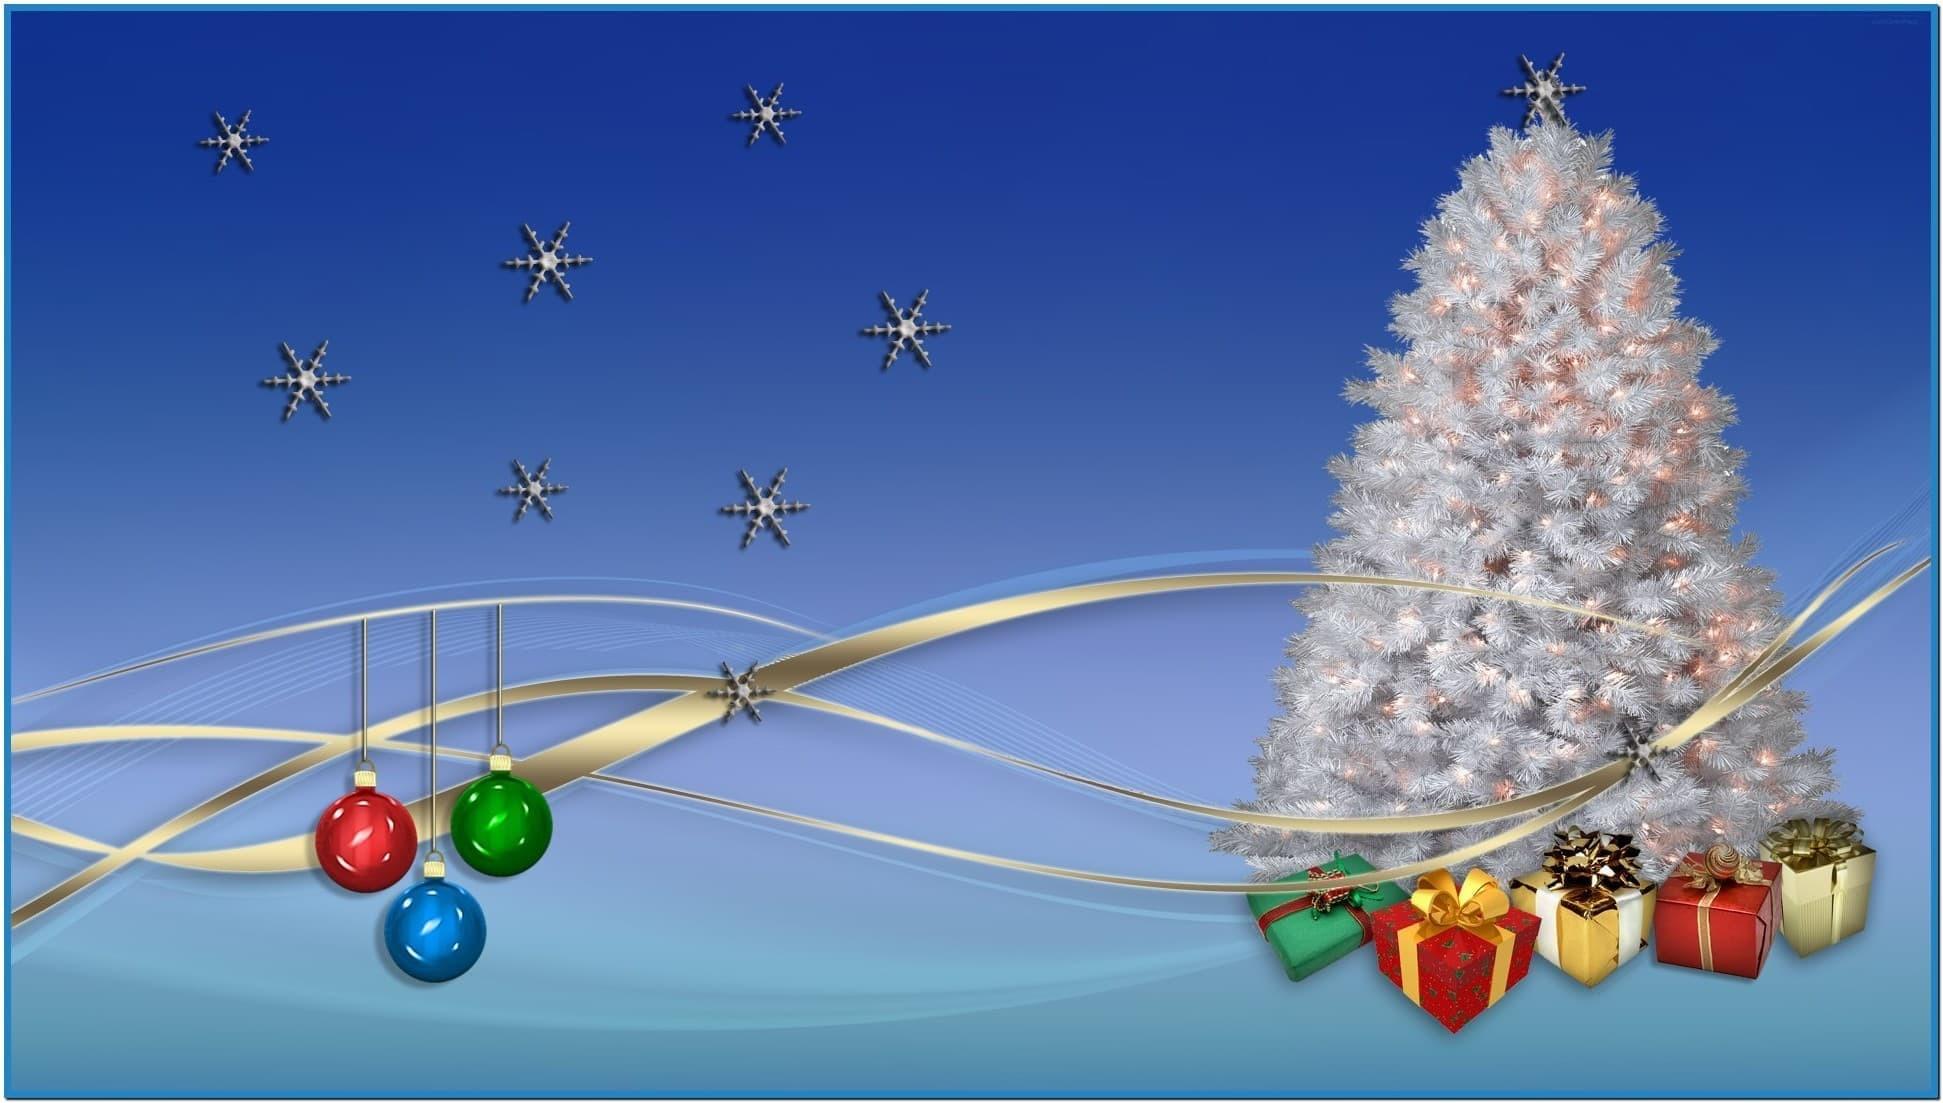 Christmas pc wallpaper screensaver